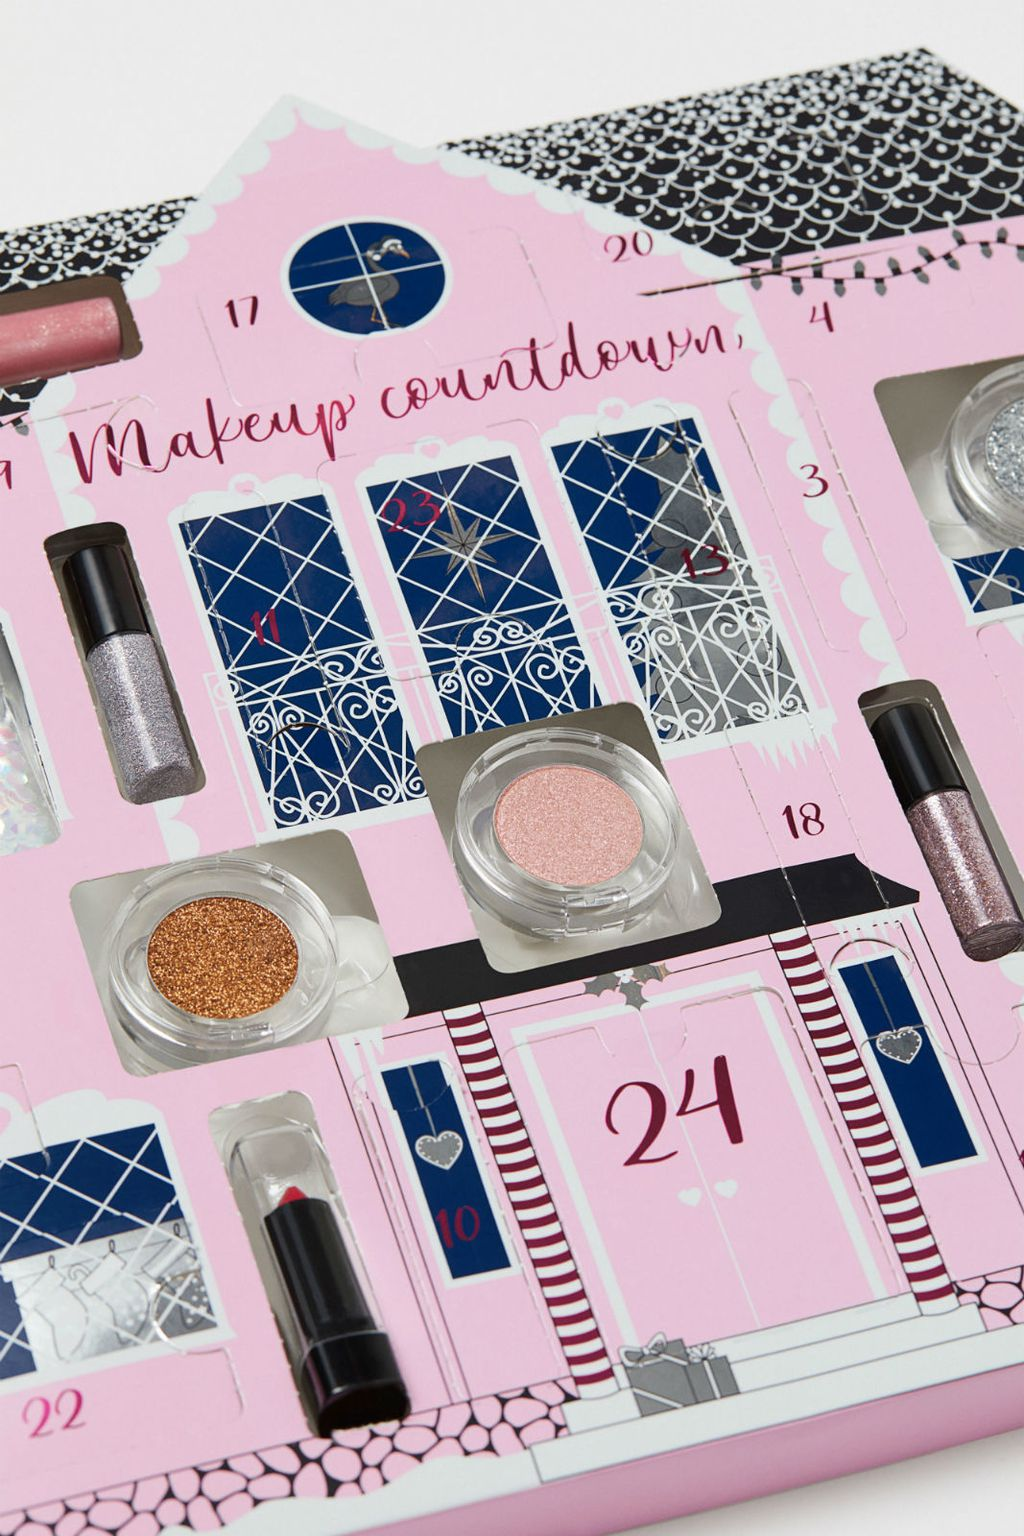 Make-up adventski kalendar iz H&M-a - 3